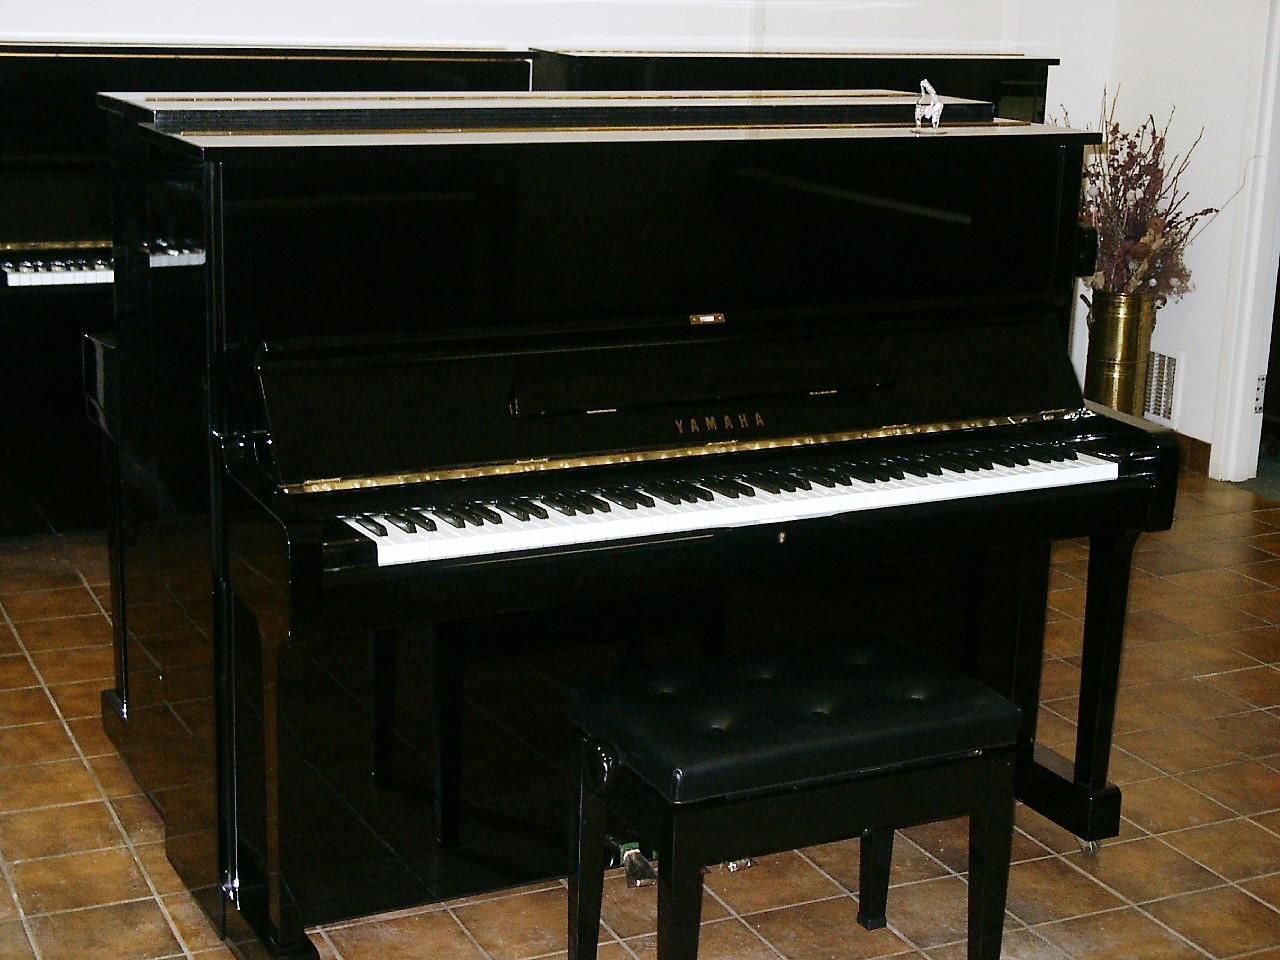 Used piano sale in toronto area yamaha u1m upright piano for Yamaha upright piano used